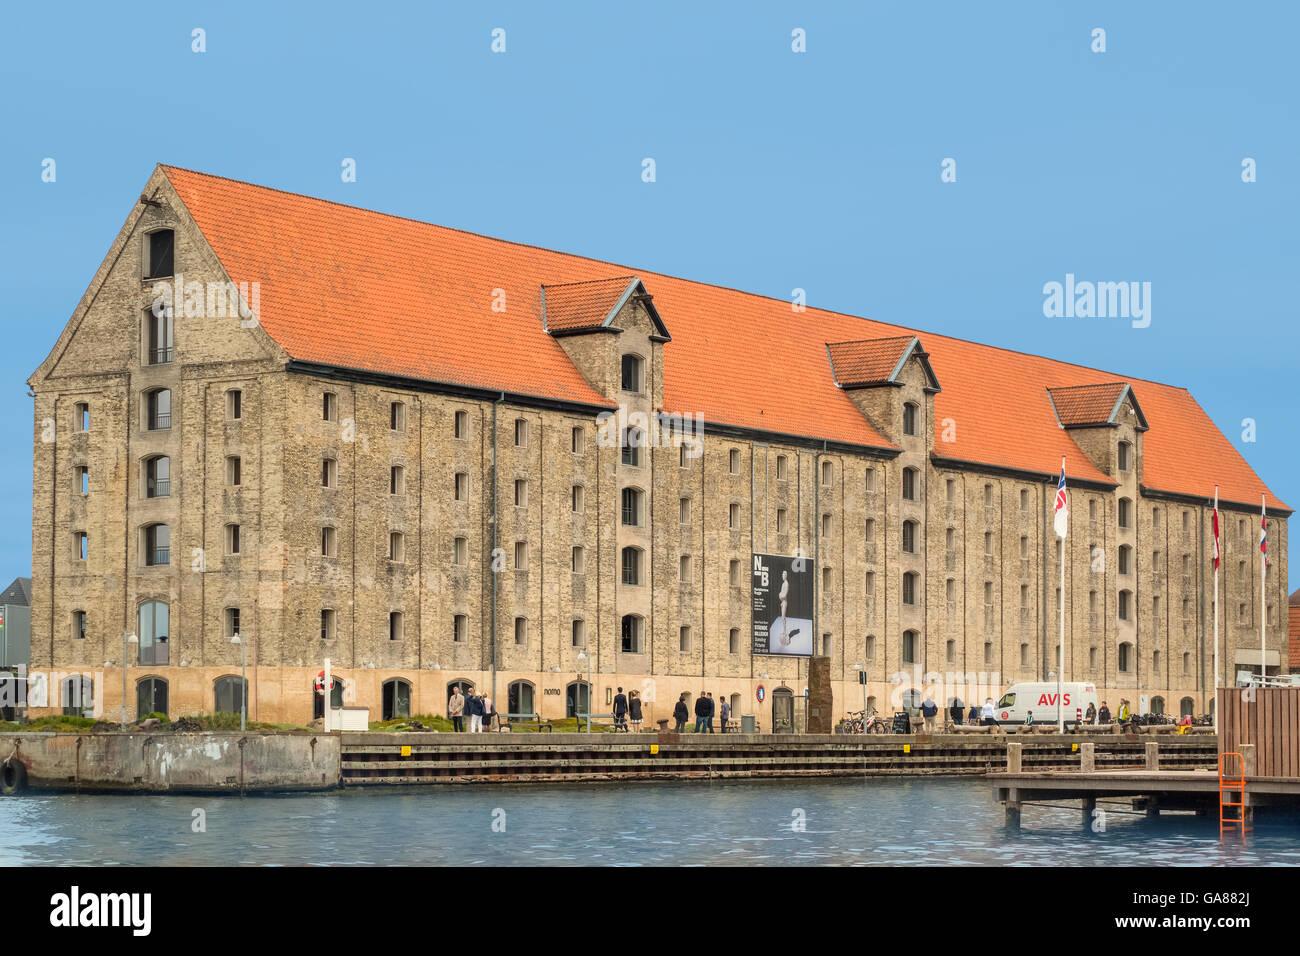 Danish Centre of Architecture Copenhagen Denmark - Stock Image